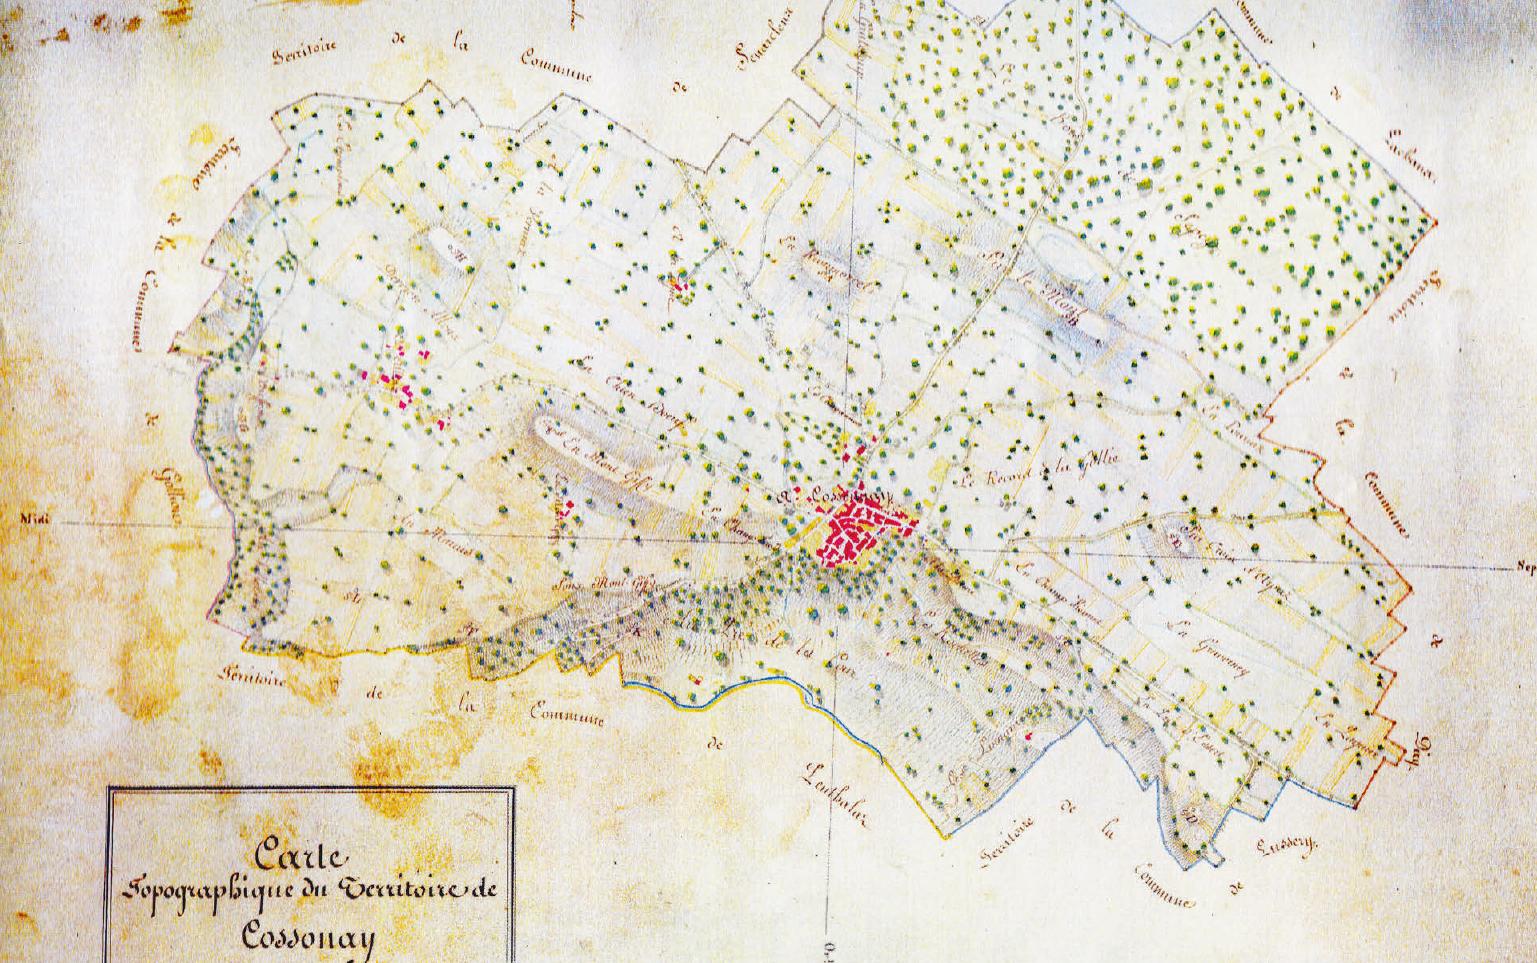 Atlas toponymique – Les lieux-dits de Cossonay